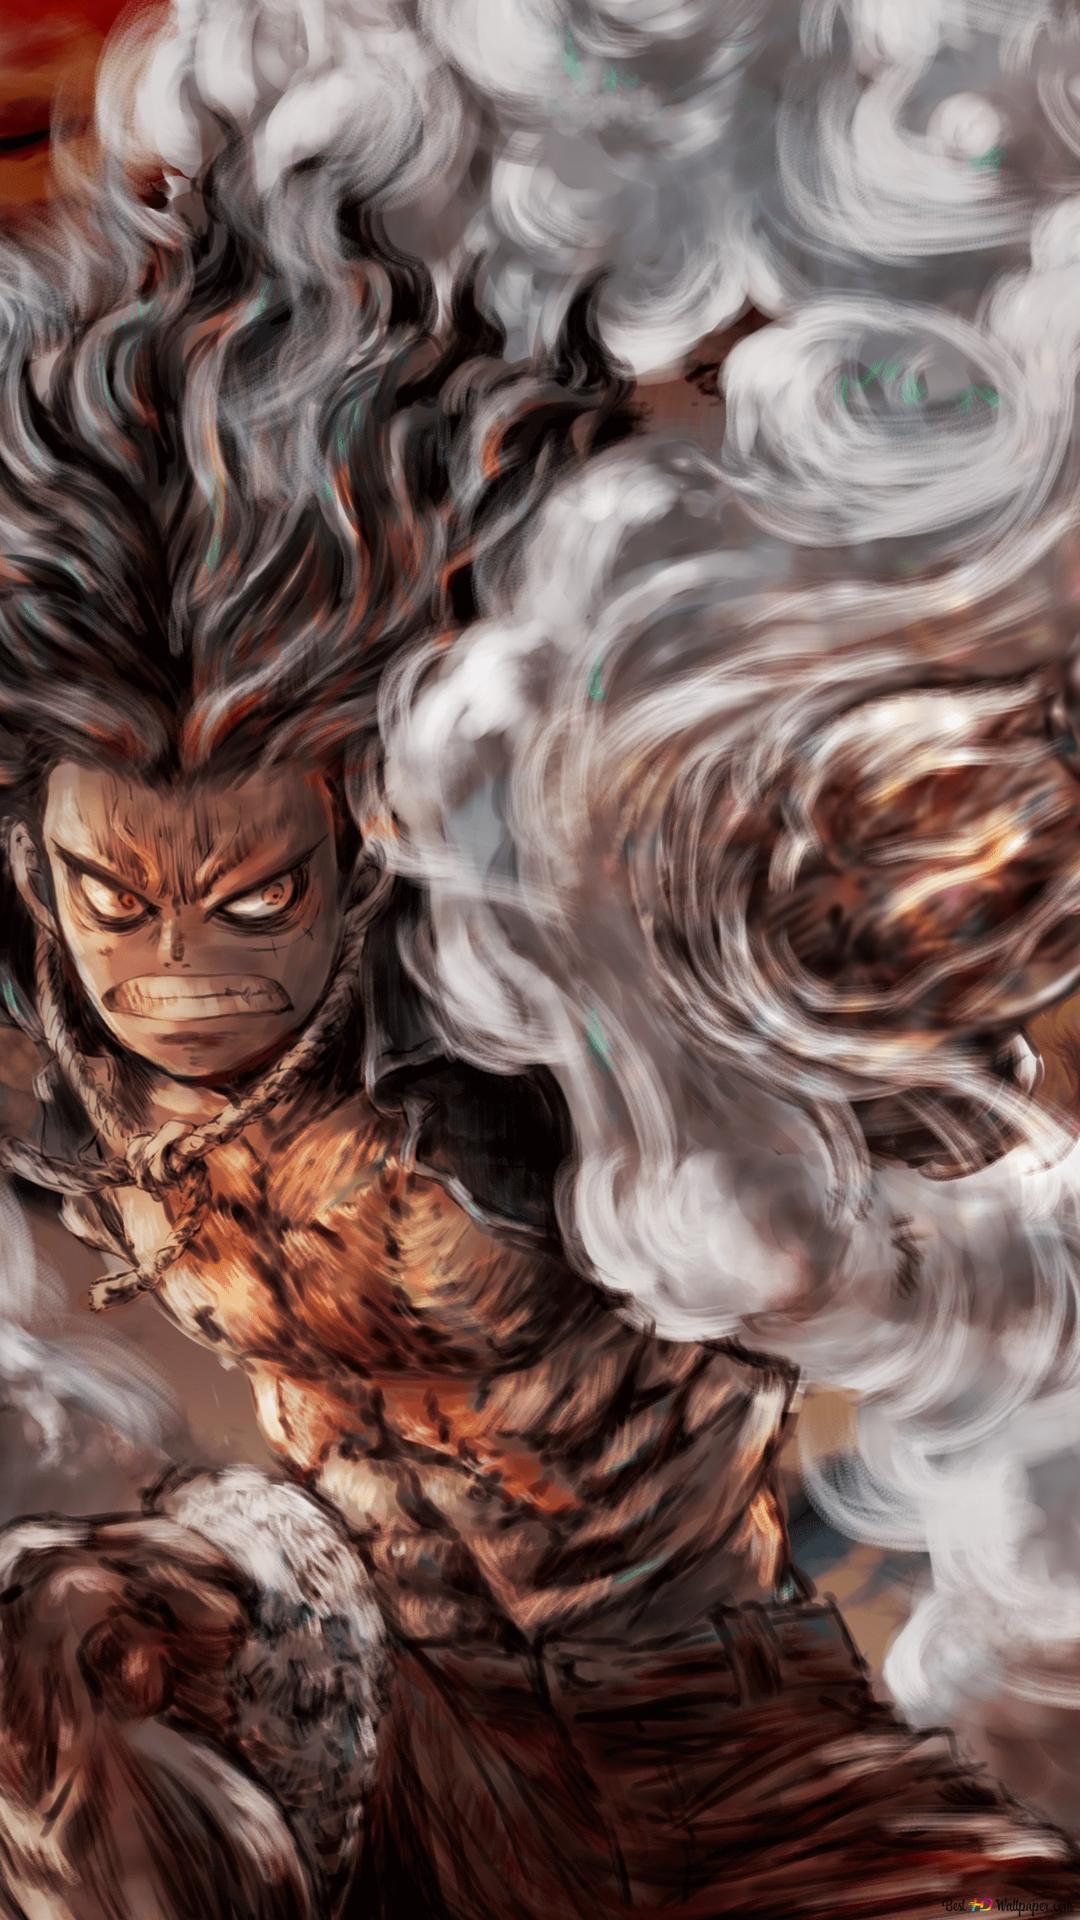 Luffy Gear 4th Snakeman Hd Wallpaper Download